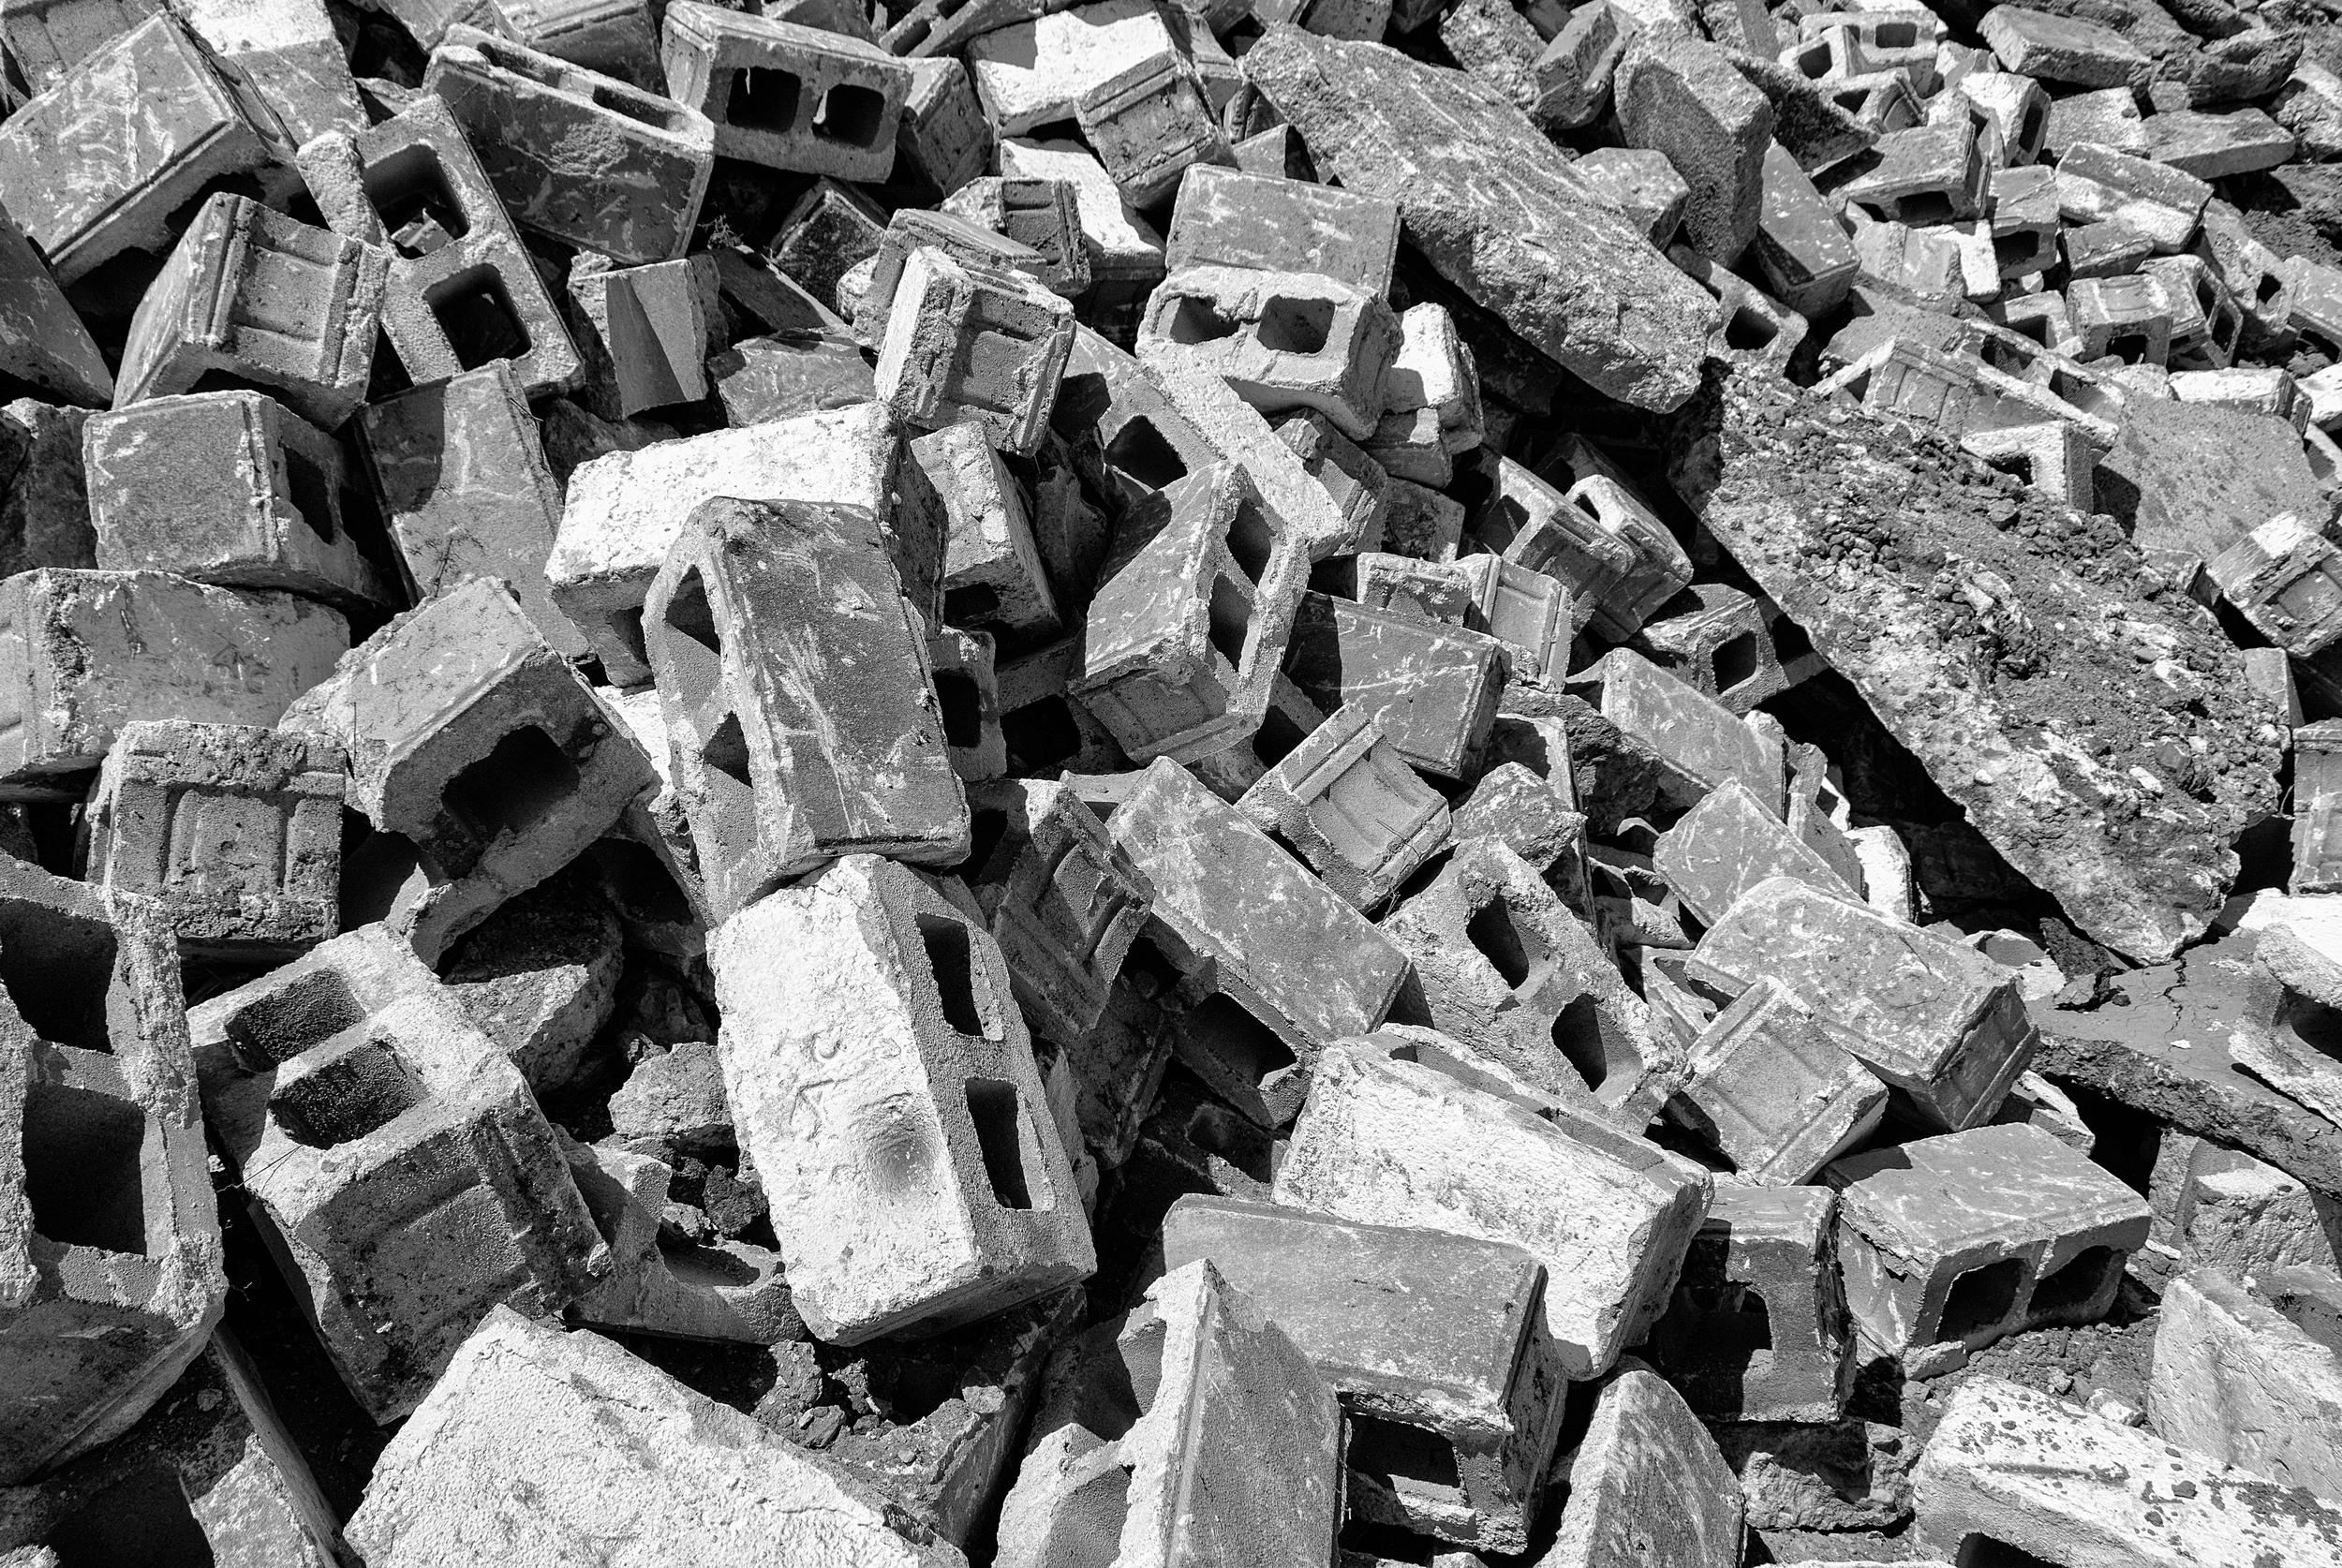 004-181311-0413-blocks.jpg